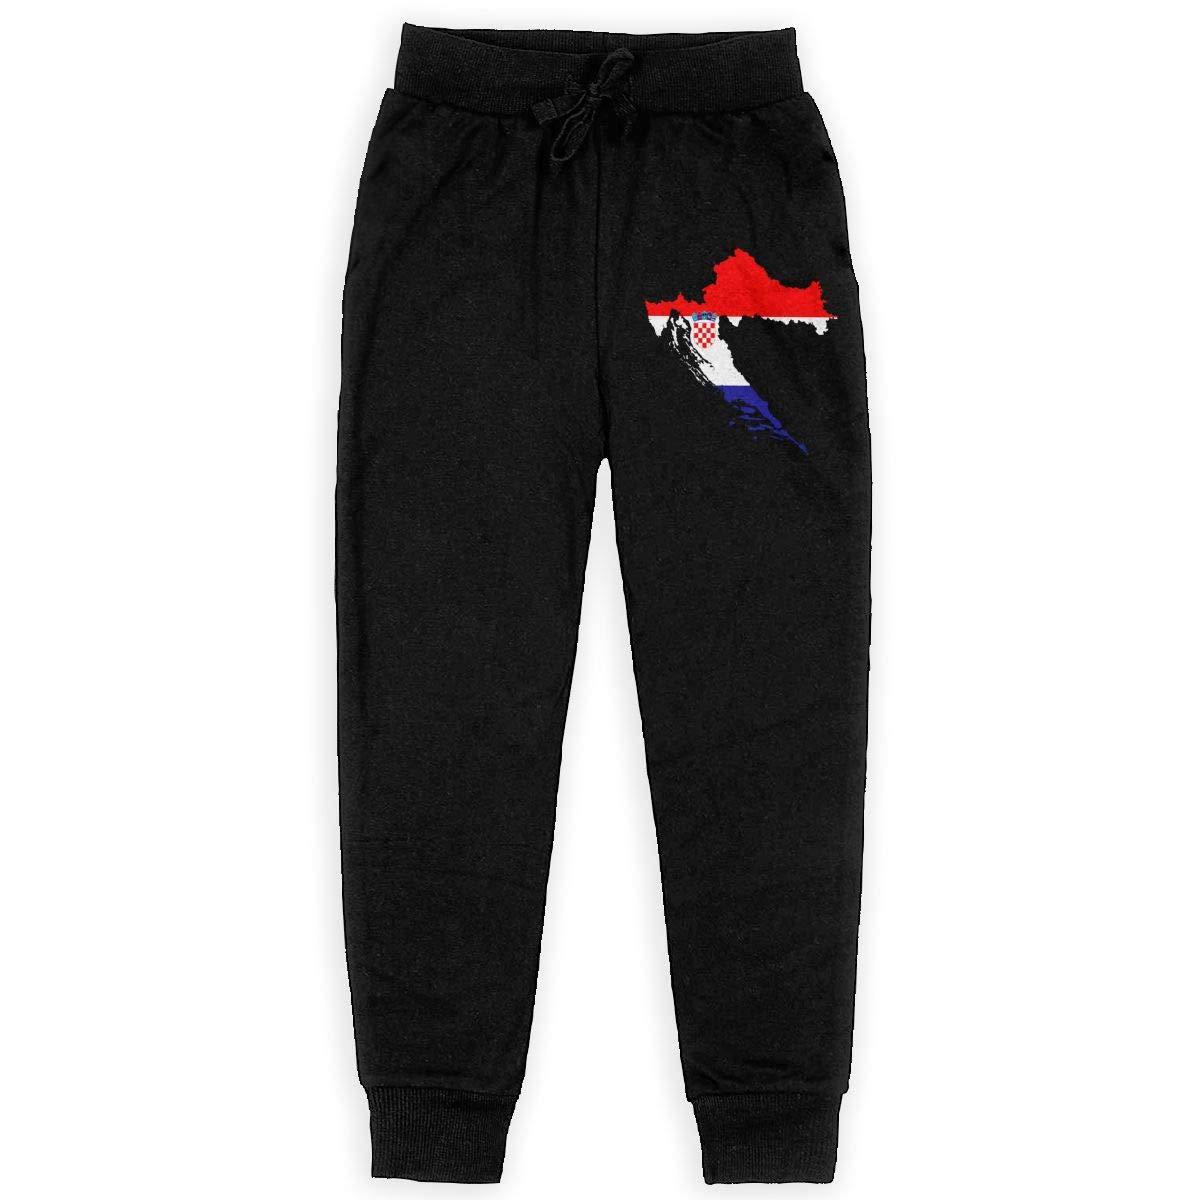 IufnNRJndfu Croatia Boys Athletic Smart Fleece Pant Youth Soft and Cozy Sweatpants